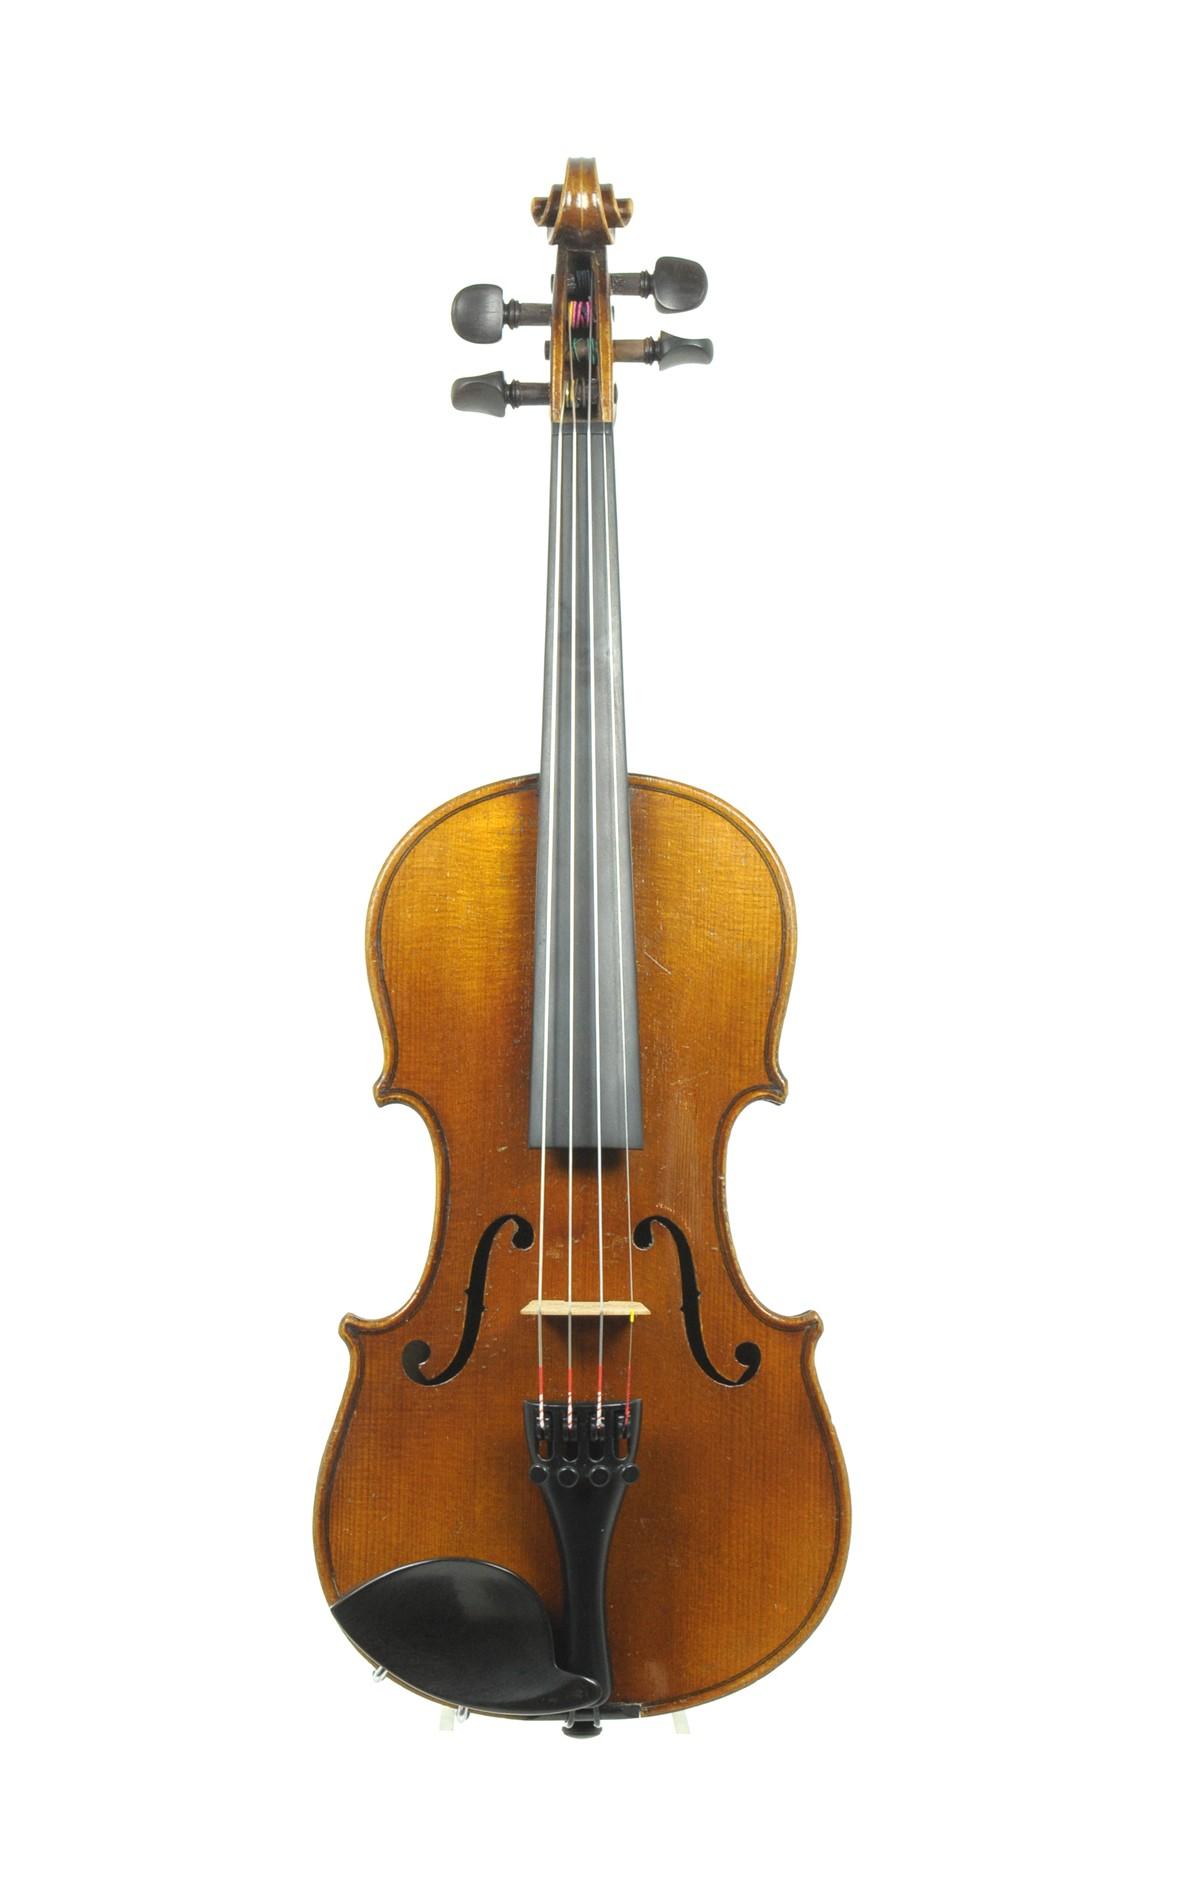 1/2 violin, Klingenthal, ca. 1900 - top